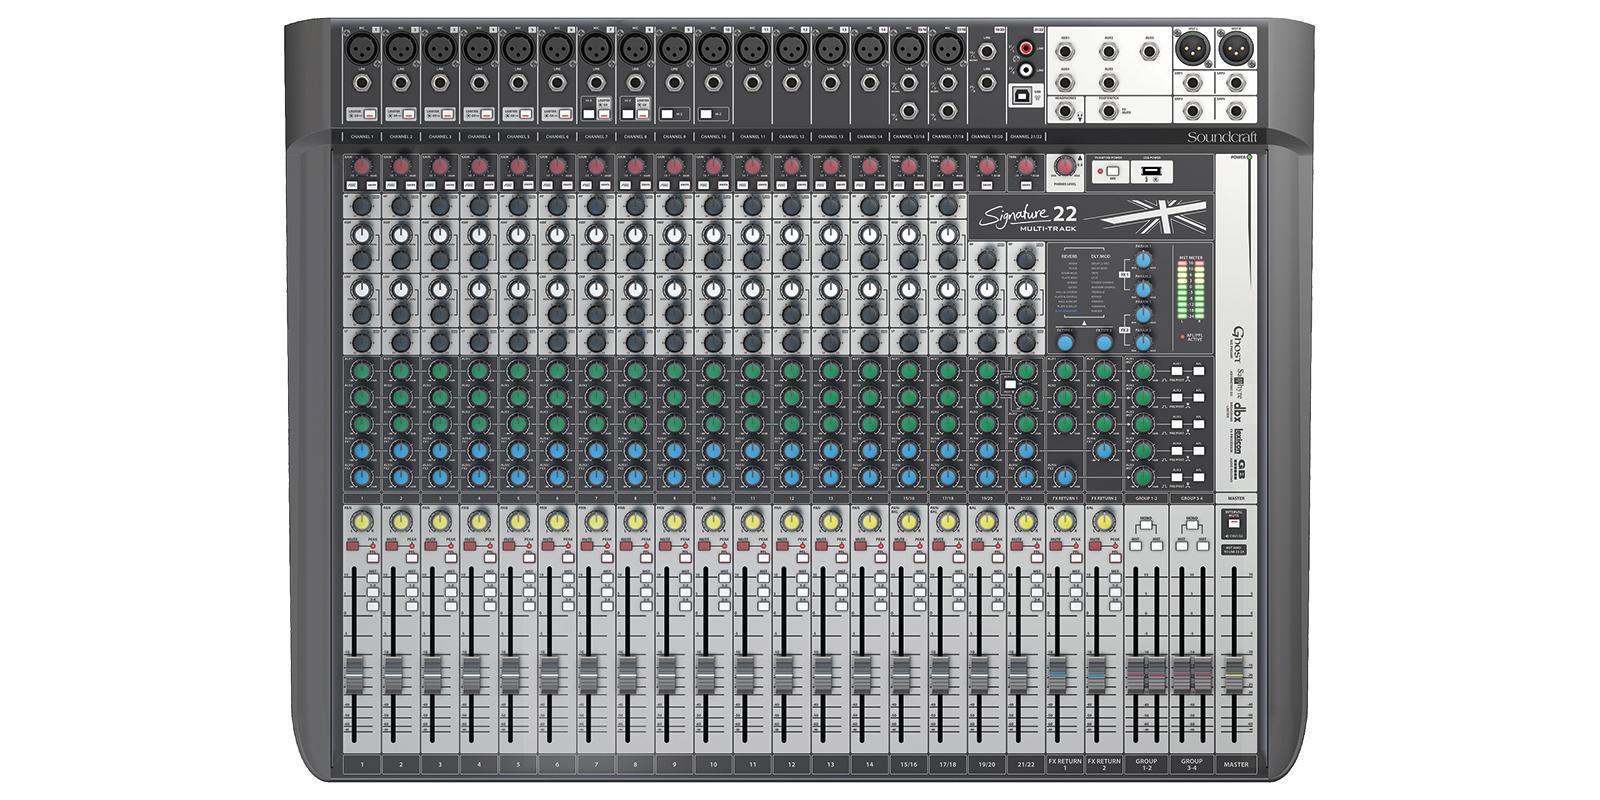 Signature 22 Mtk Soundcraft Professional Audio Mixers